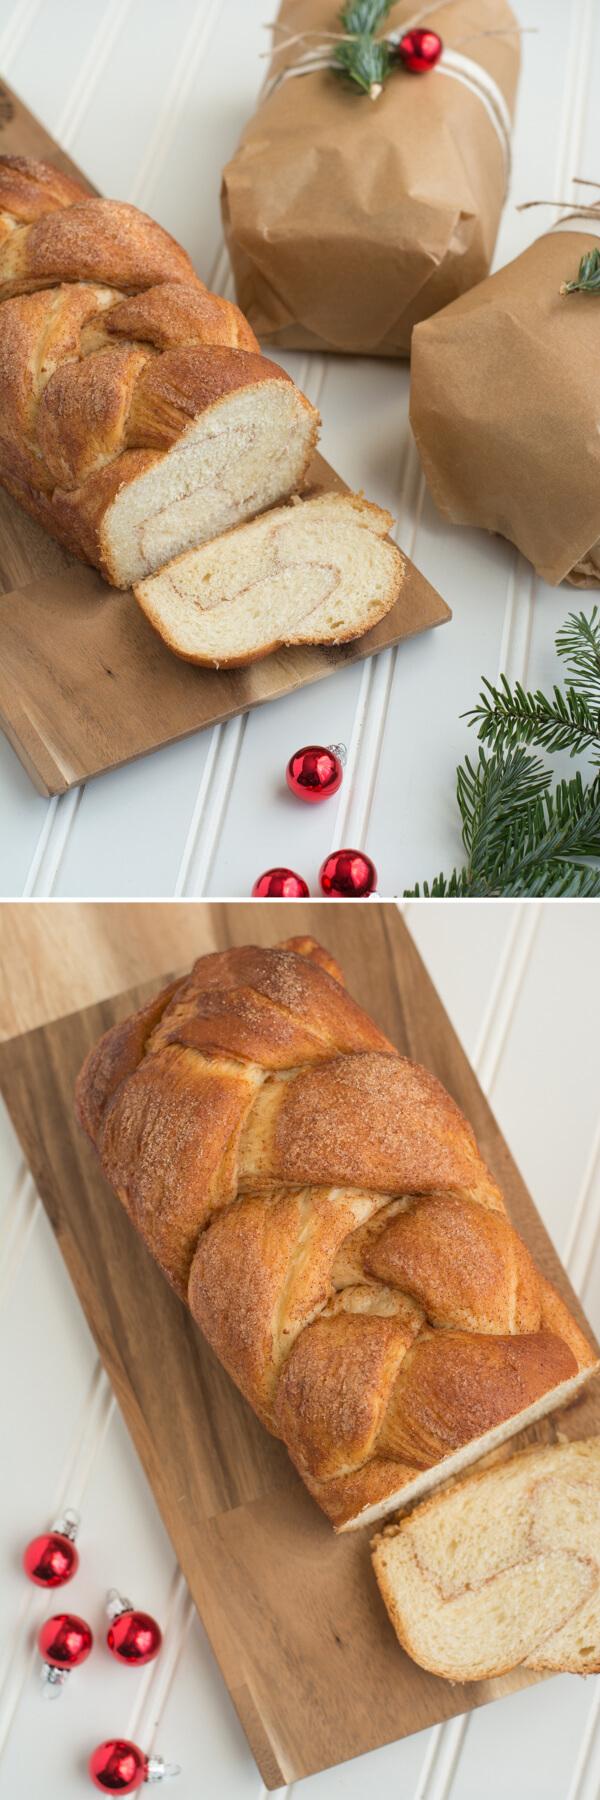 A delicious Christmas treat - Cinnamon Braid Bread | this heart of mine